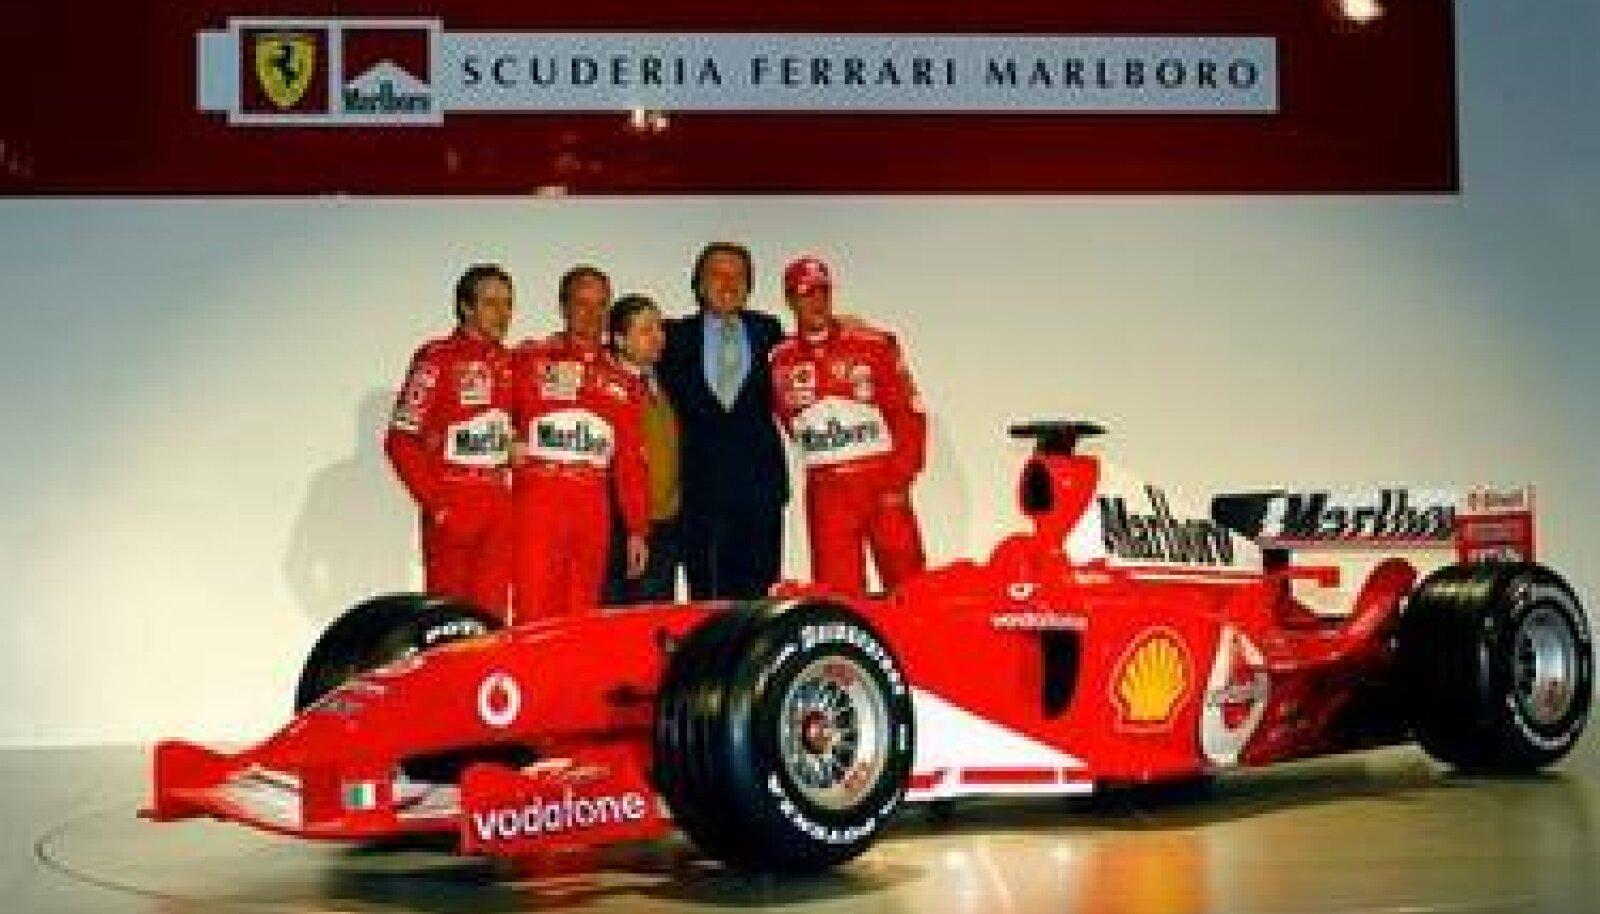 Ferrari F2004, Luca Badoer, Rubens Barrichello, Jean Todt, Luca Montezemolo ja Michael Schumacher